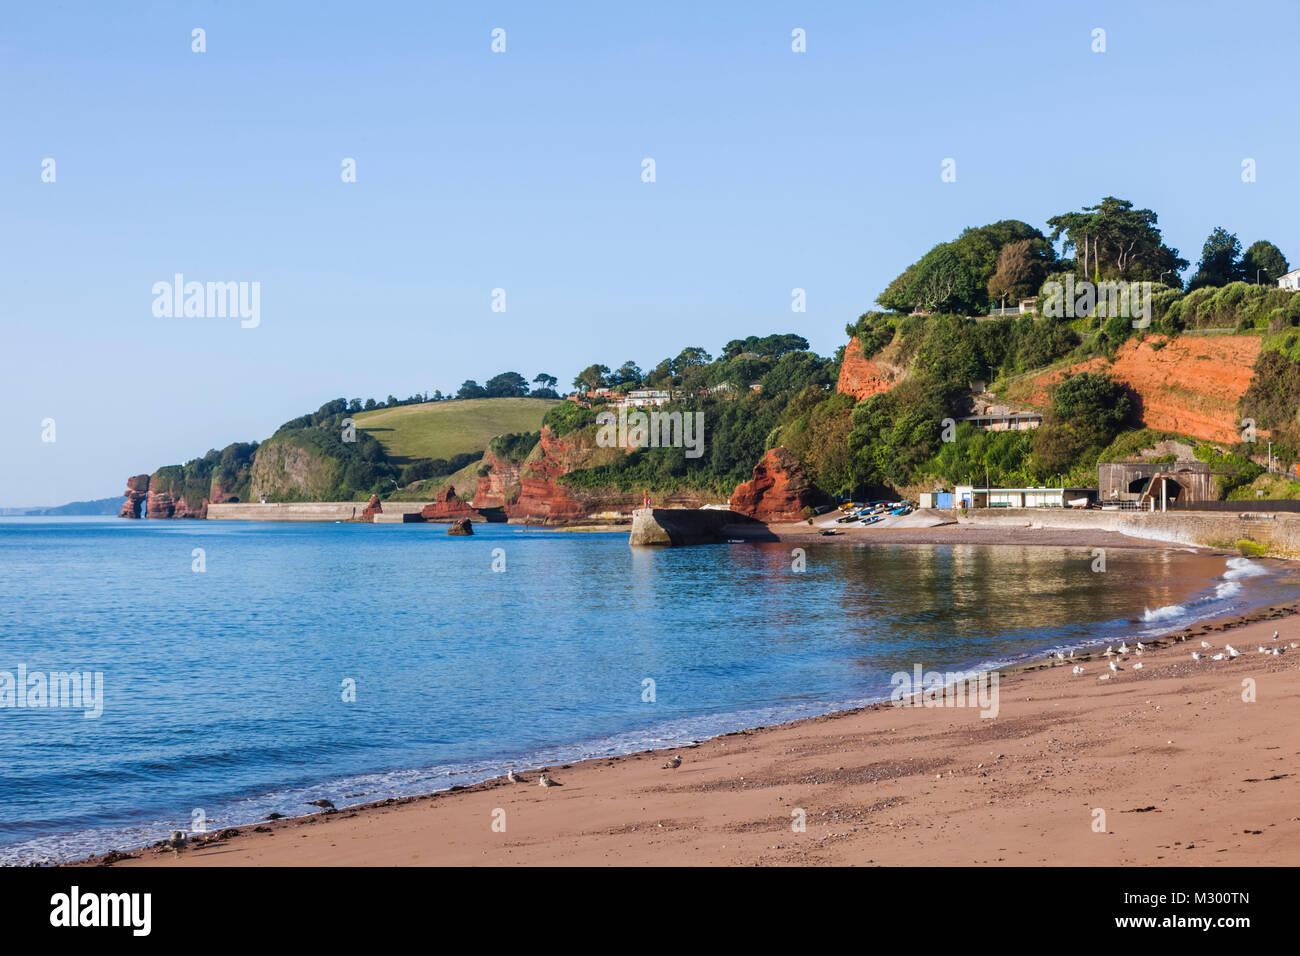 England, Devon, Dawlish, Dawlish Beach - Stock Image